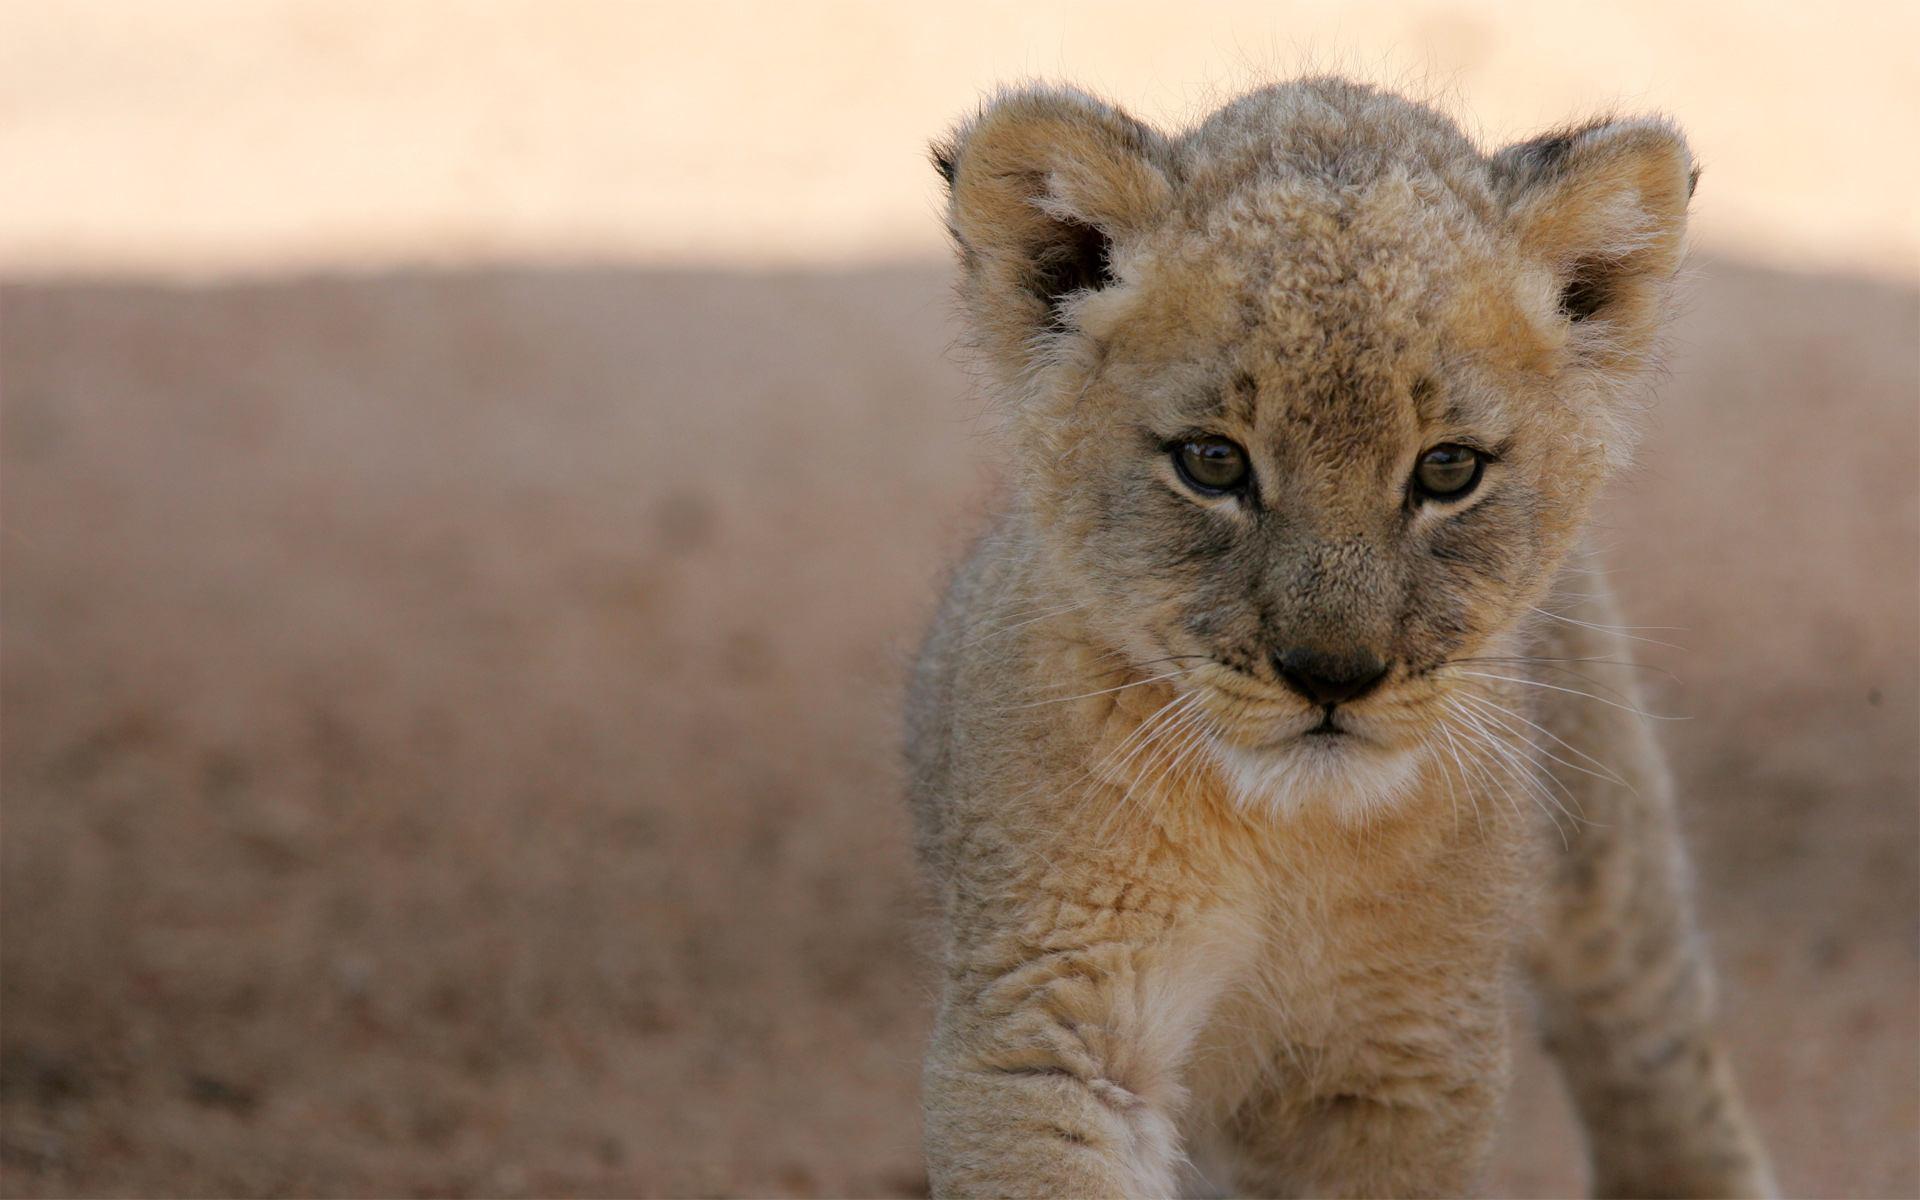 Adorable Lioness Wallpaper